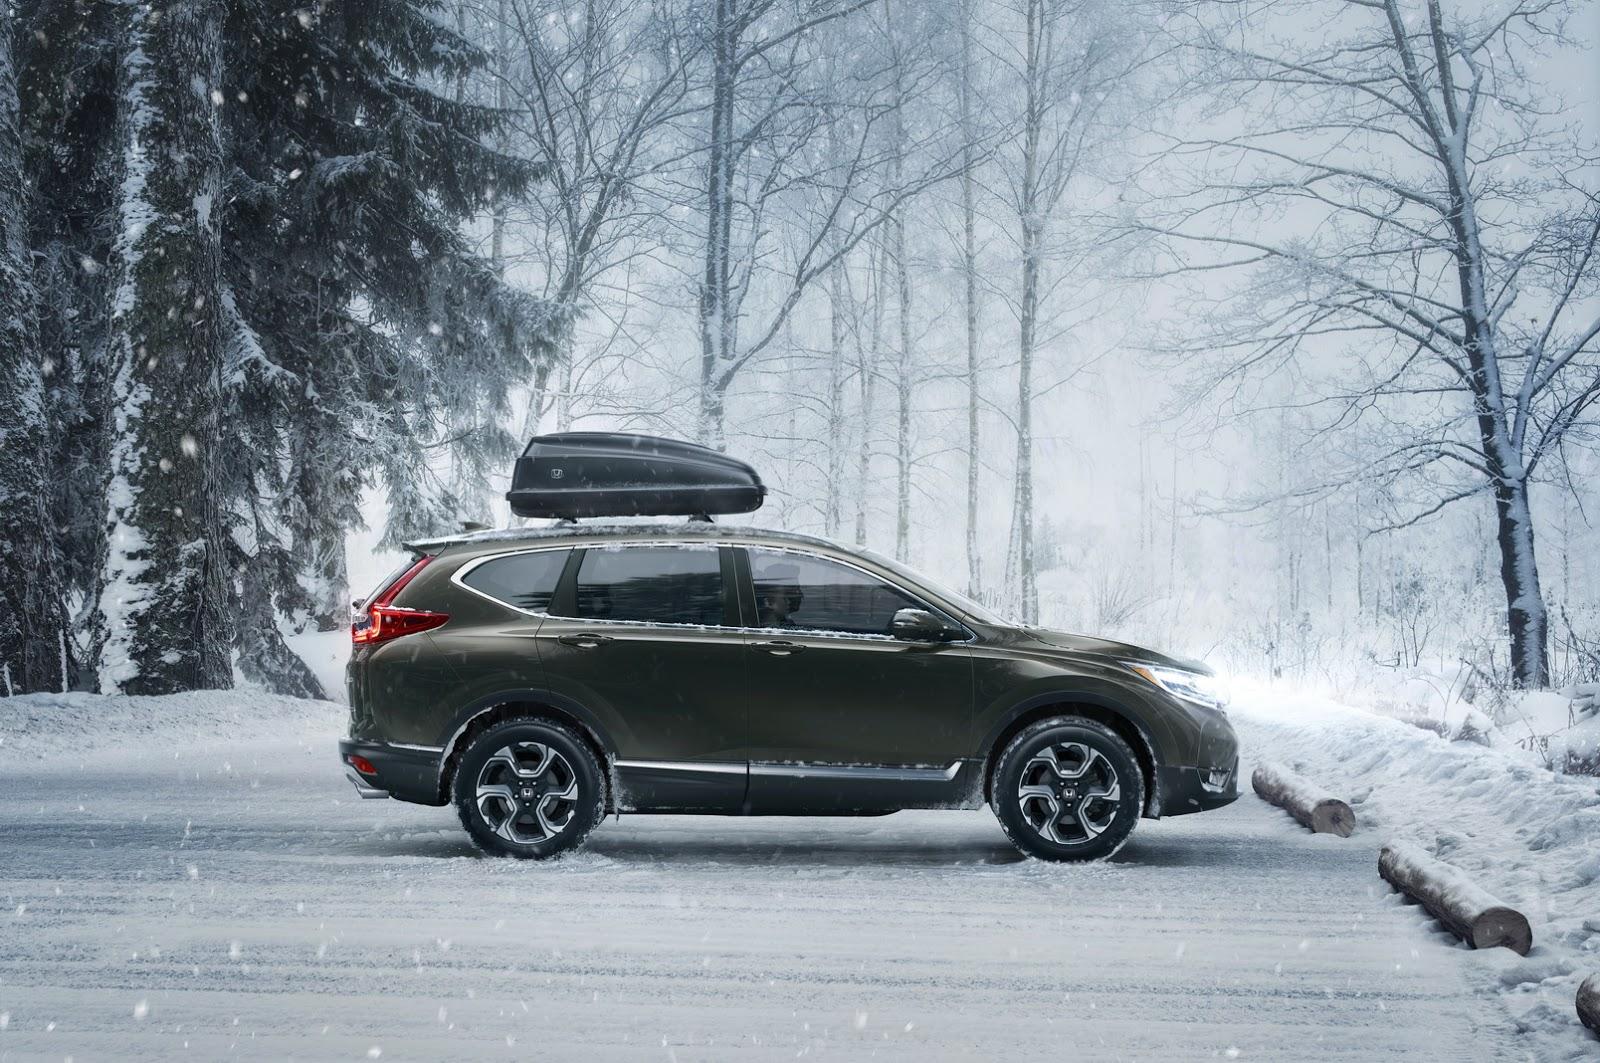 2018 Honda CR-V, Holmes Honda